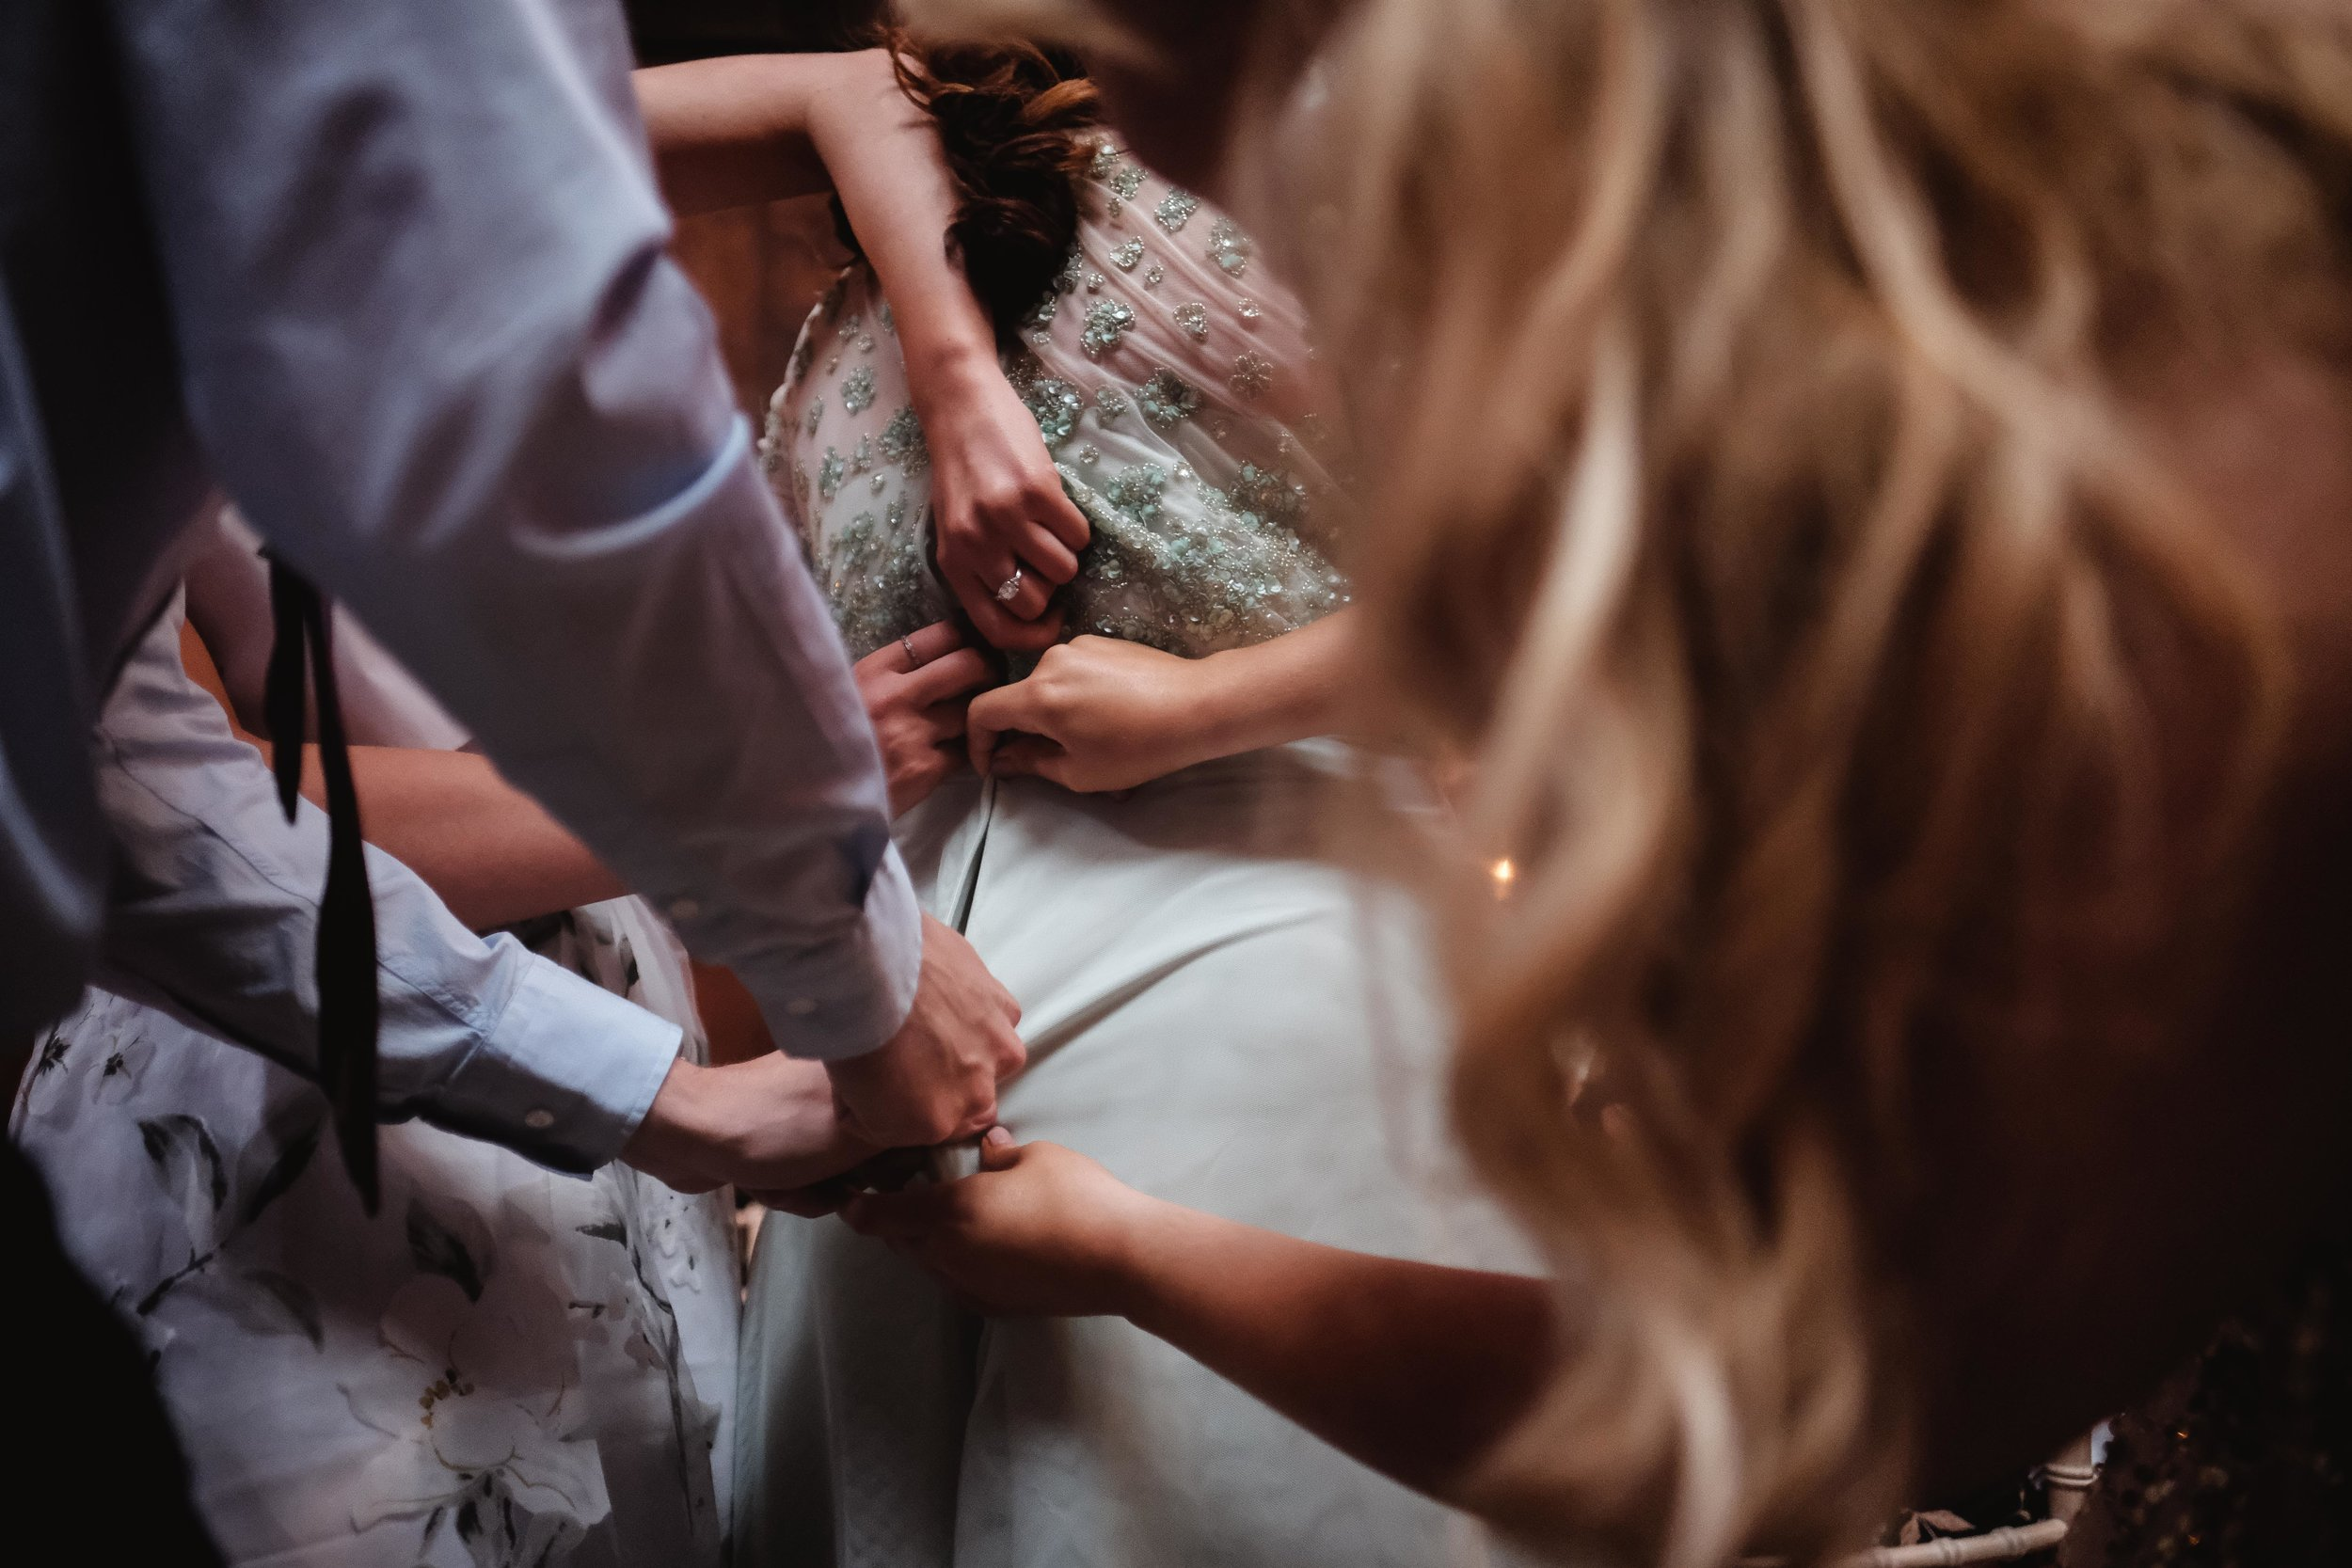 Thornton manor wedding photography cheshire wedding photographer liverpool manchester warrington chester wirral wedding BLOG (63 of 108).jpg